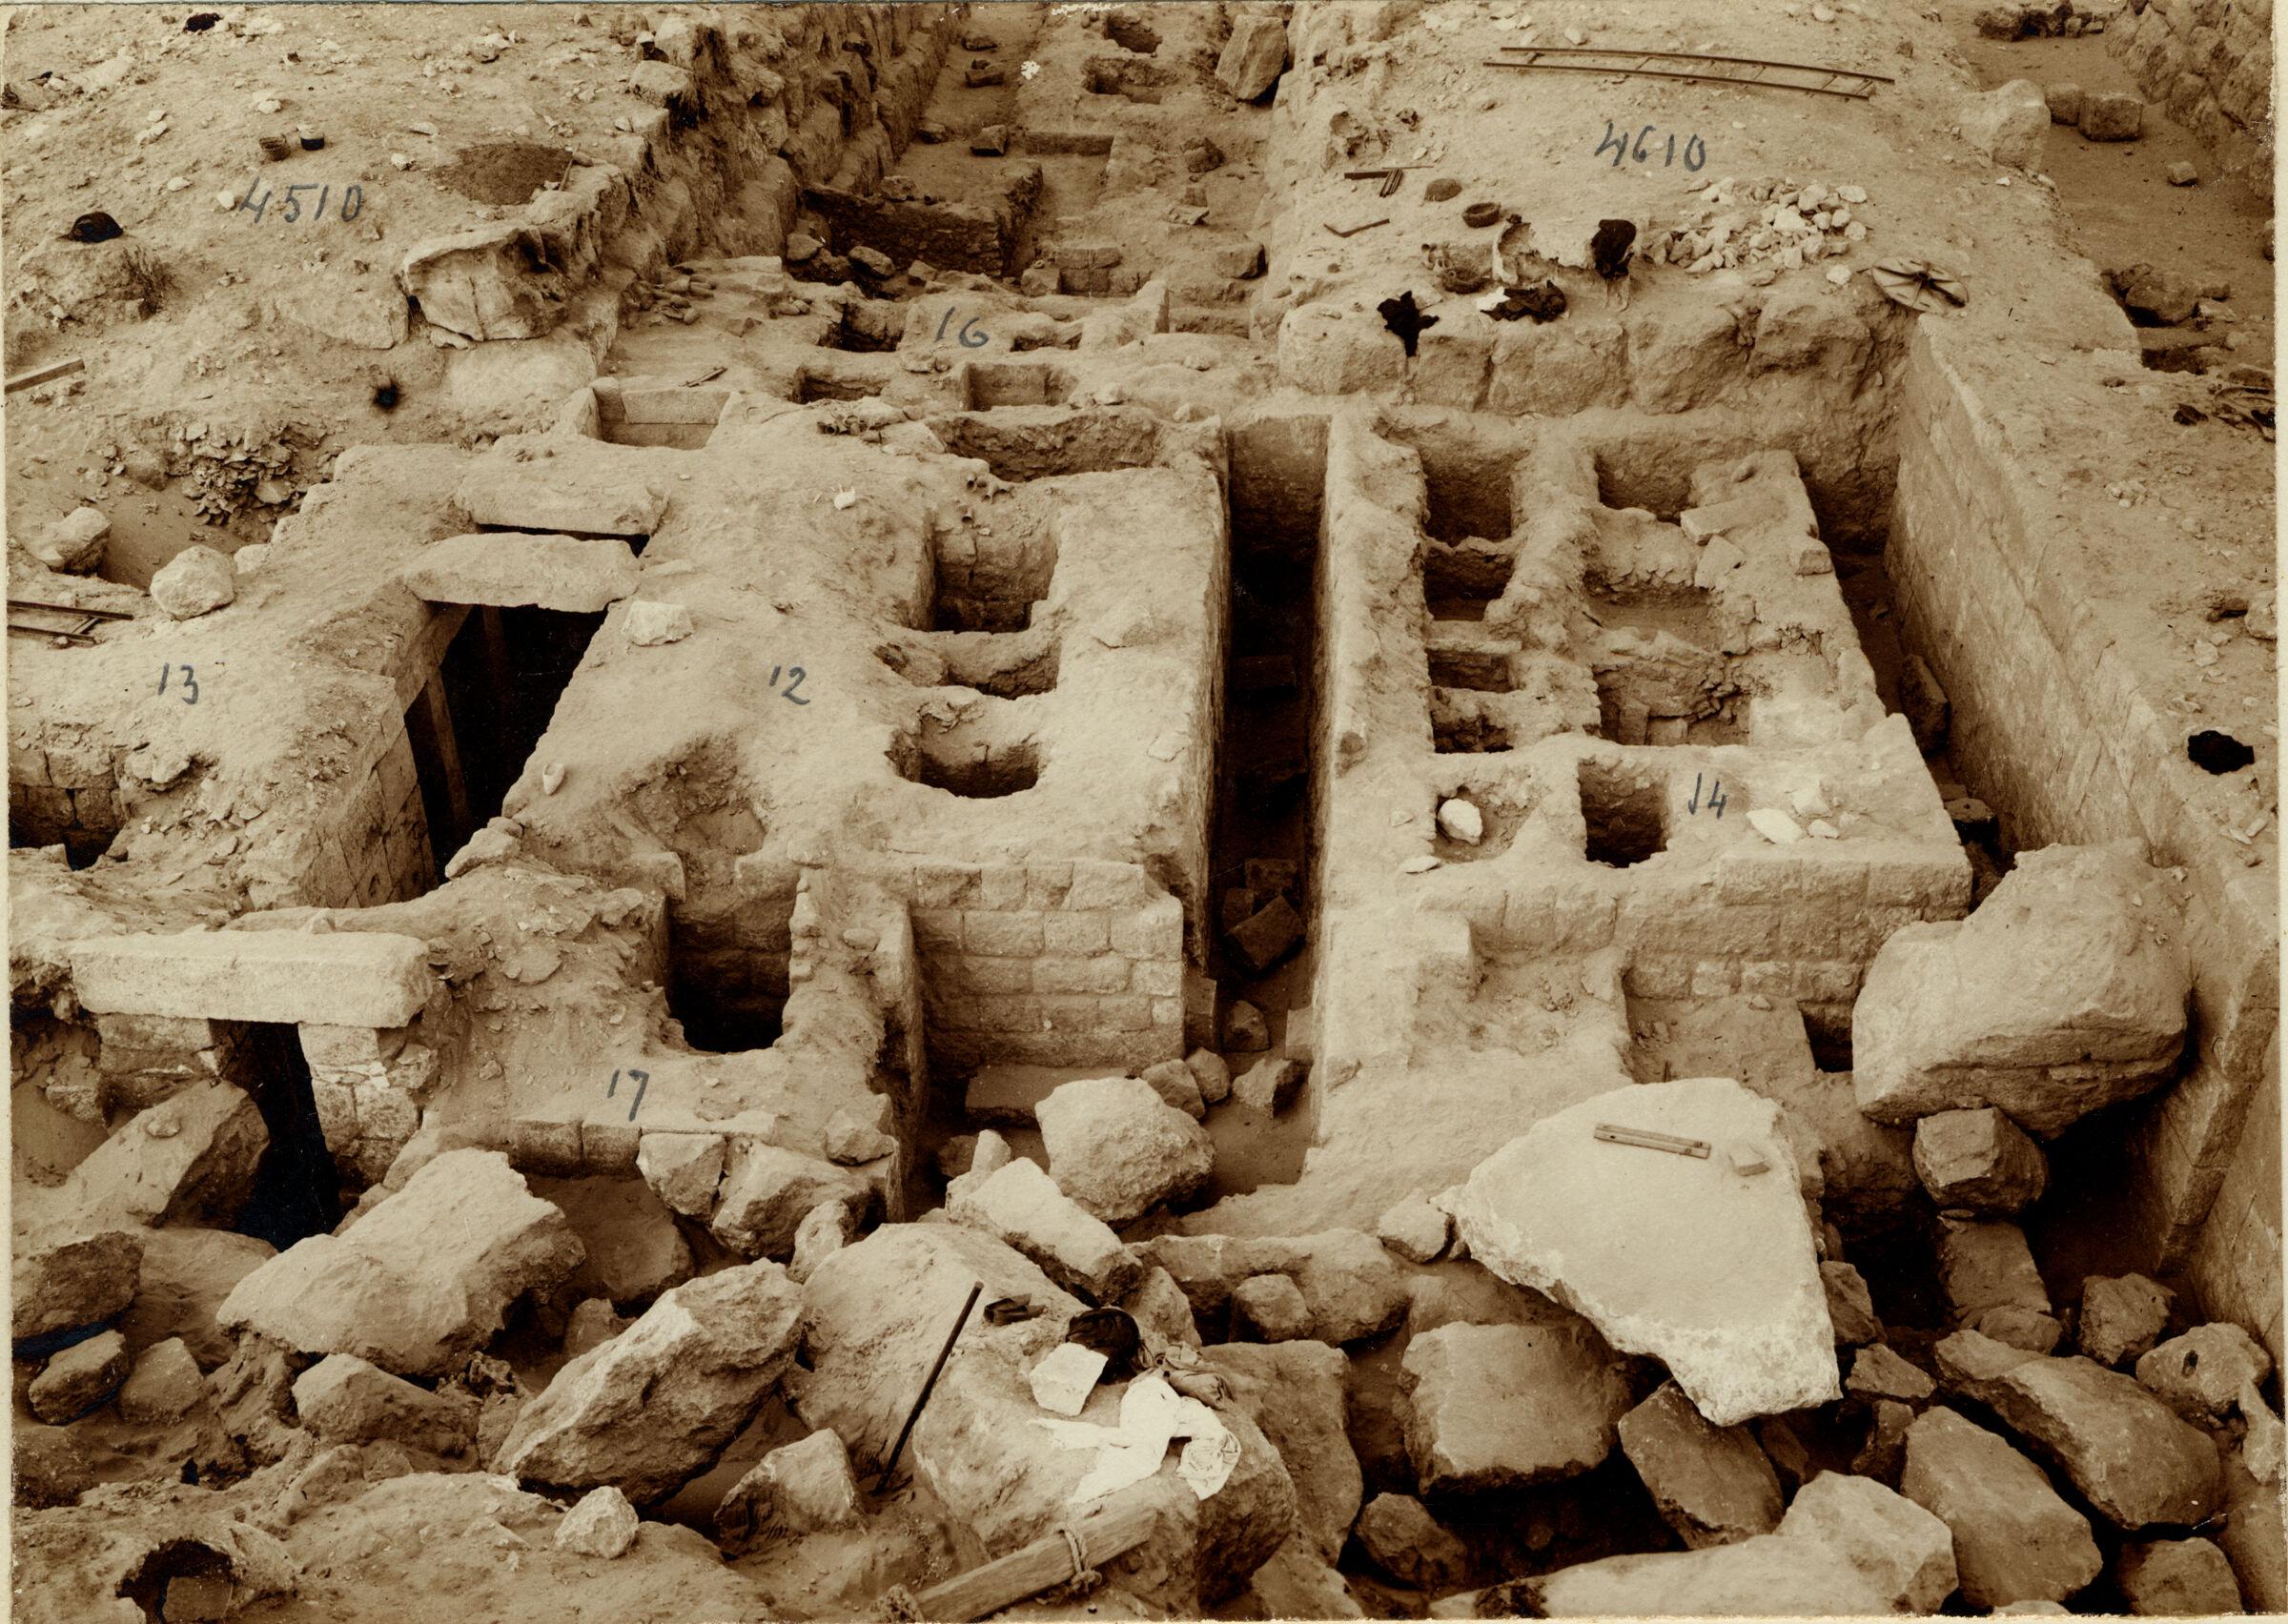 Western Cemetery: Site: Giza; View: G 4510, G 4610, G 4513, G 4512, G 4517, G 4516, G 4514